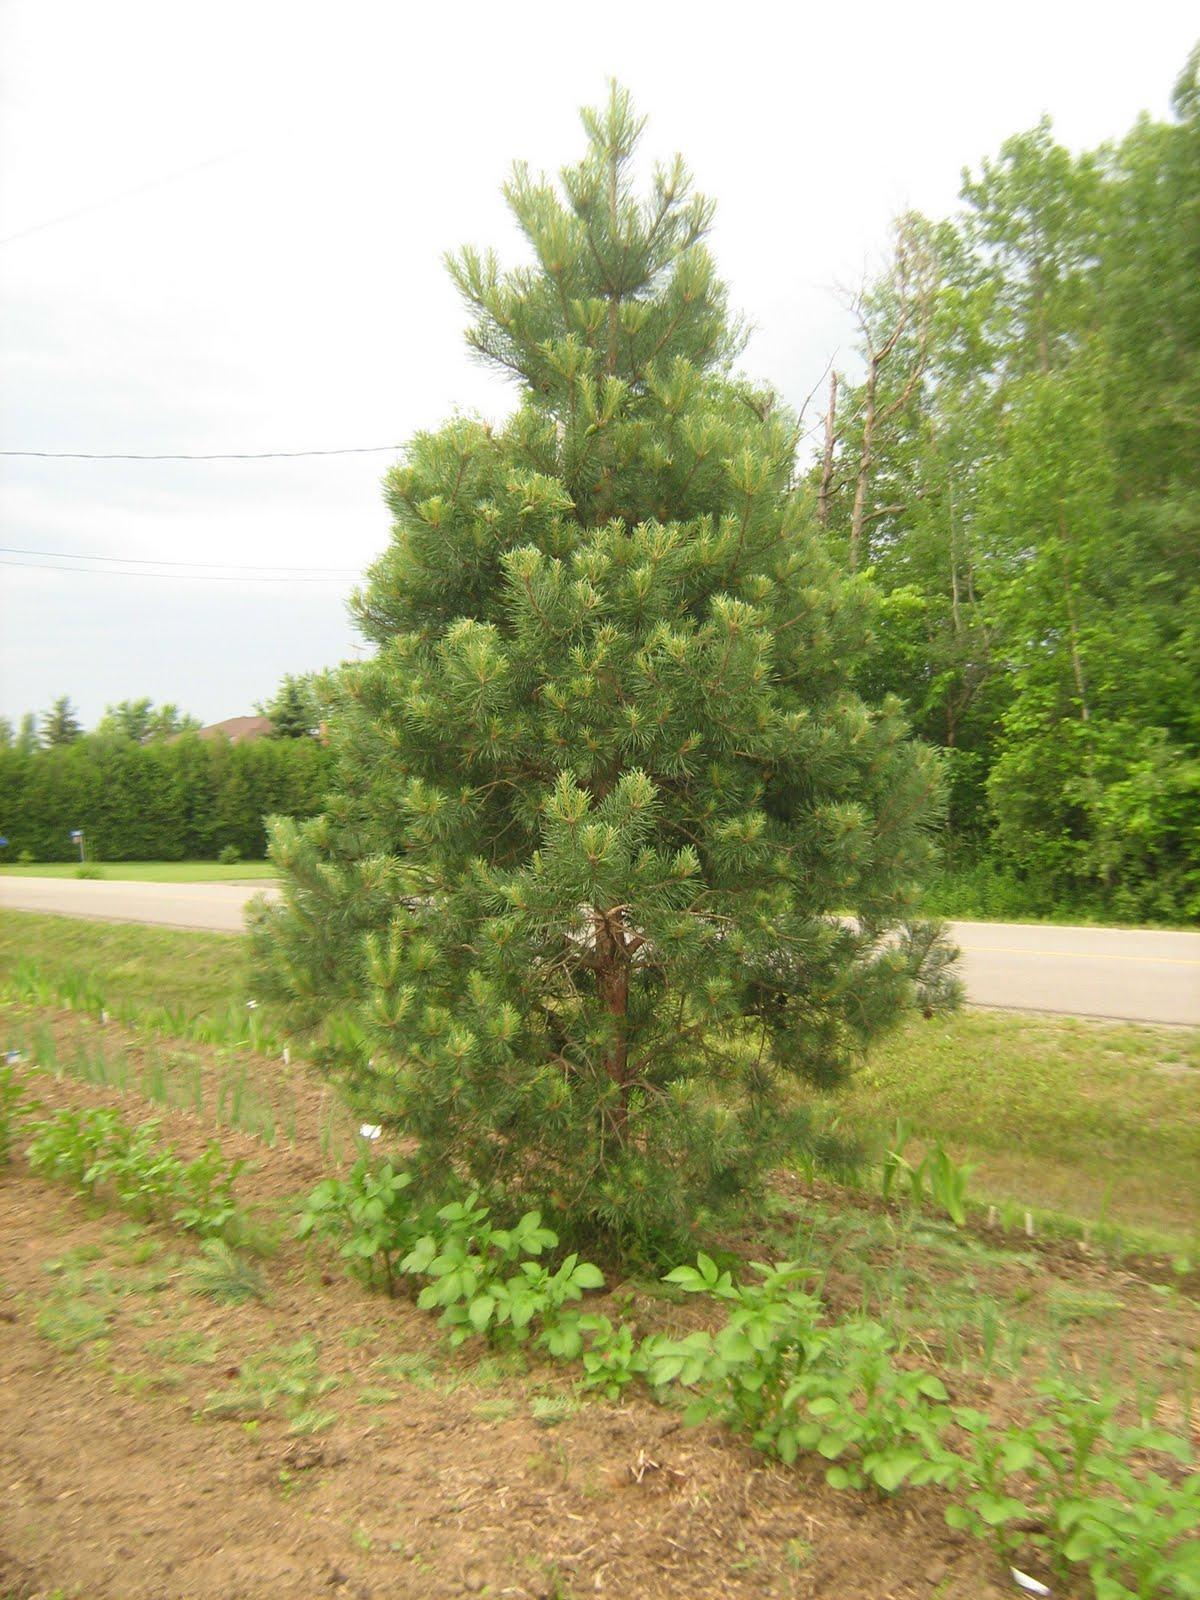 The Musical Gardener: Pruning Scotch Pine Christmas Trees